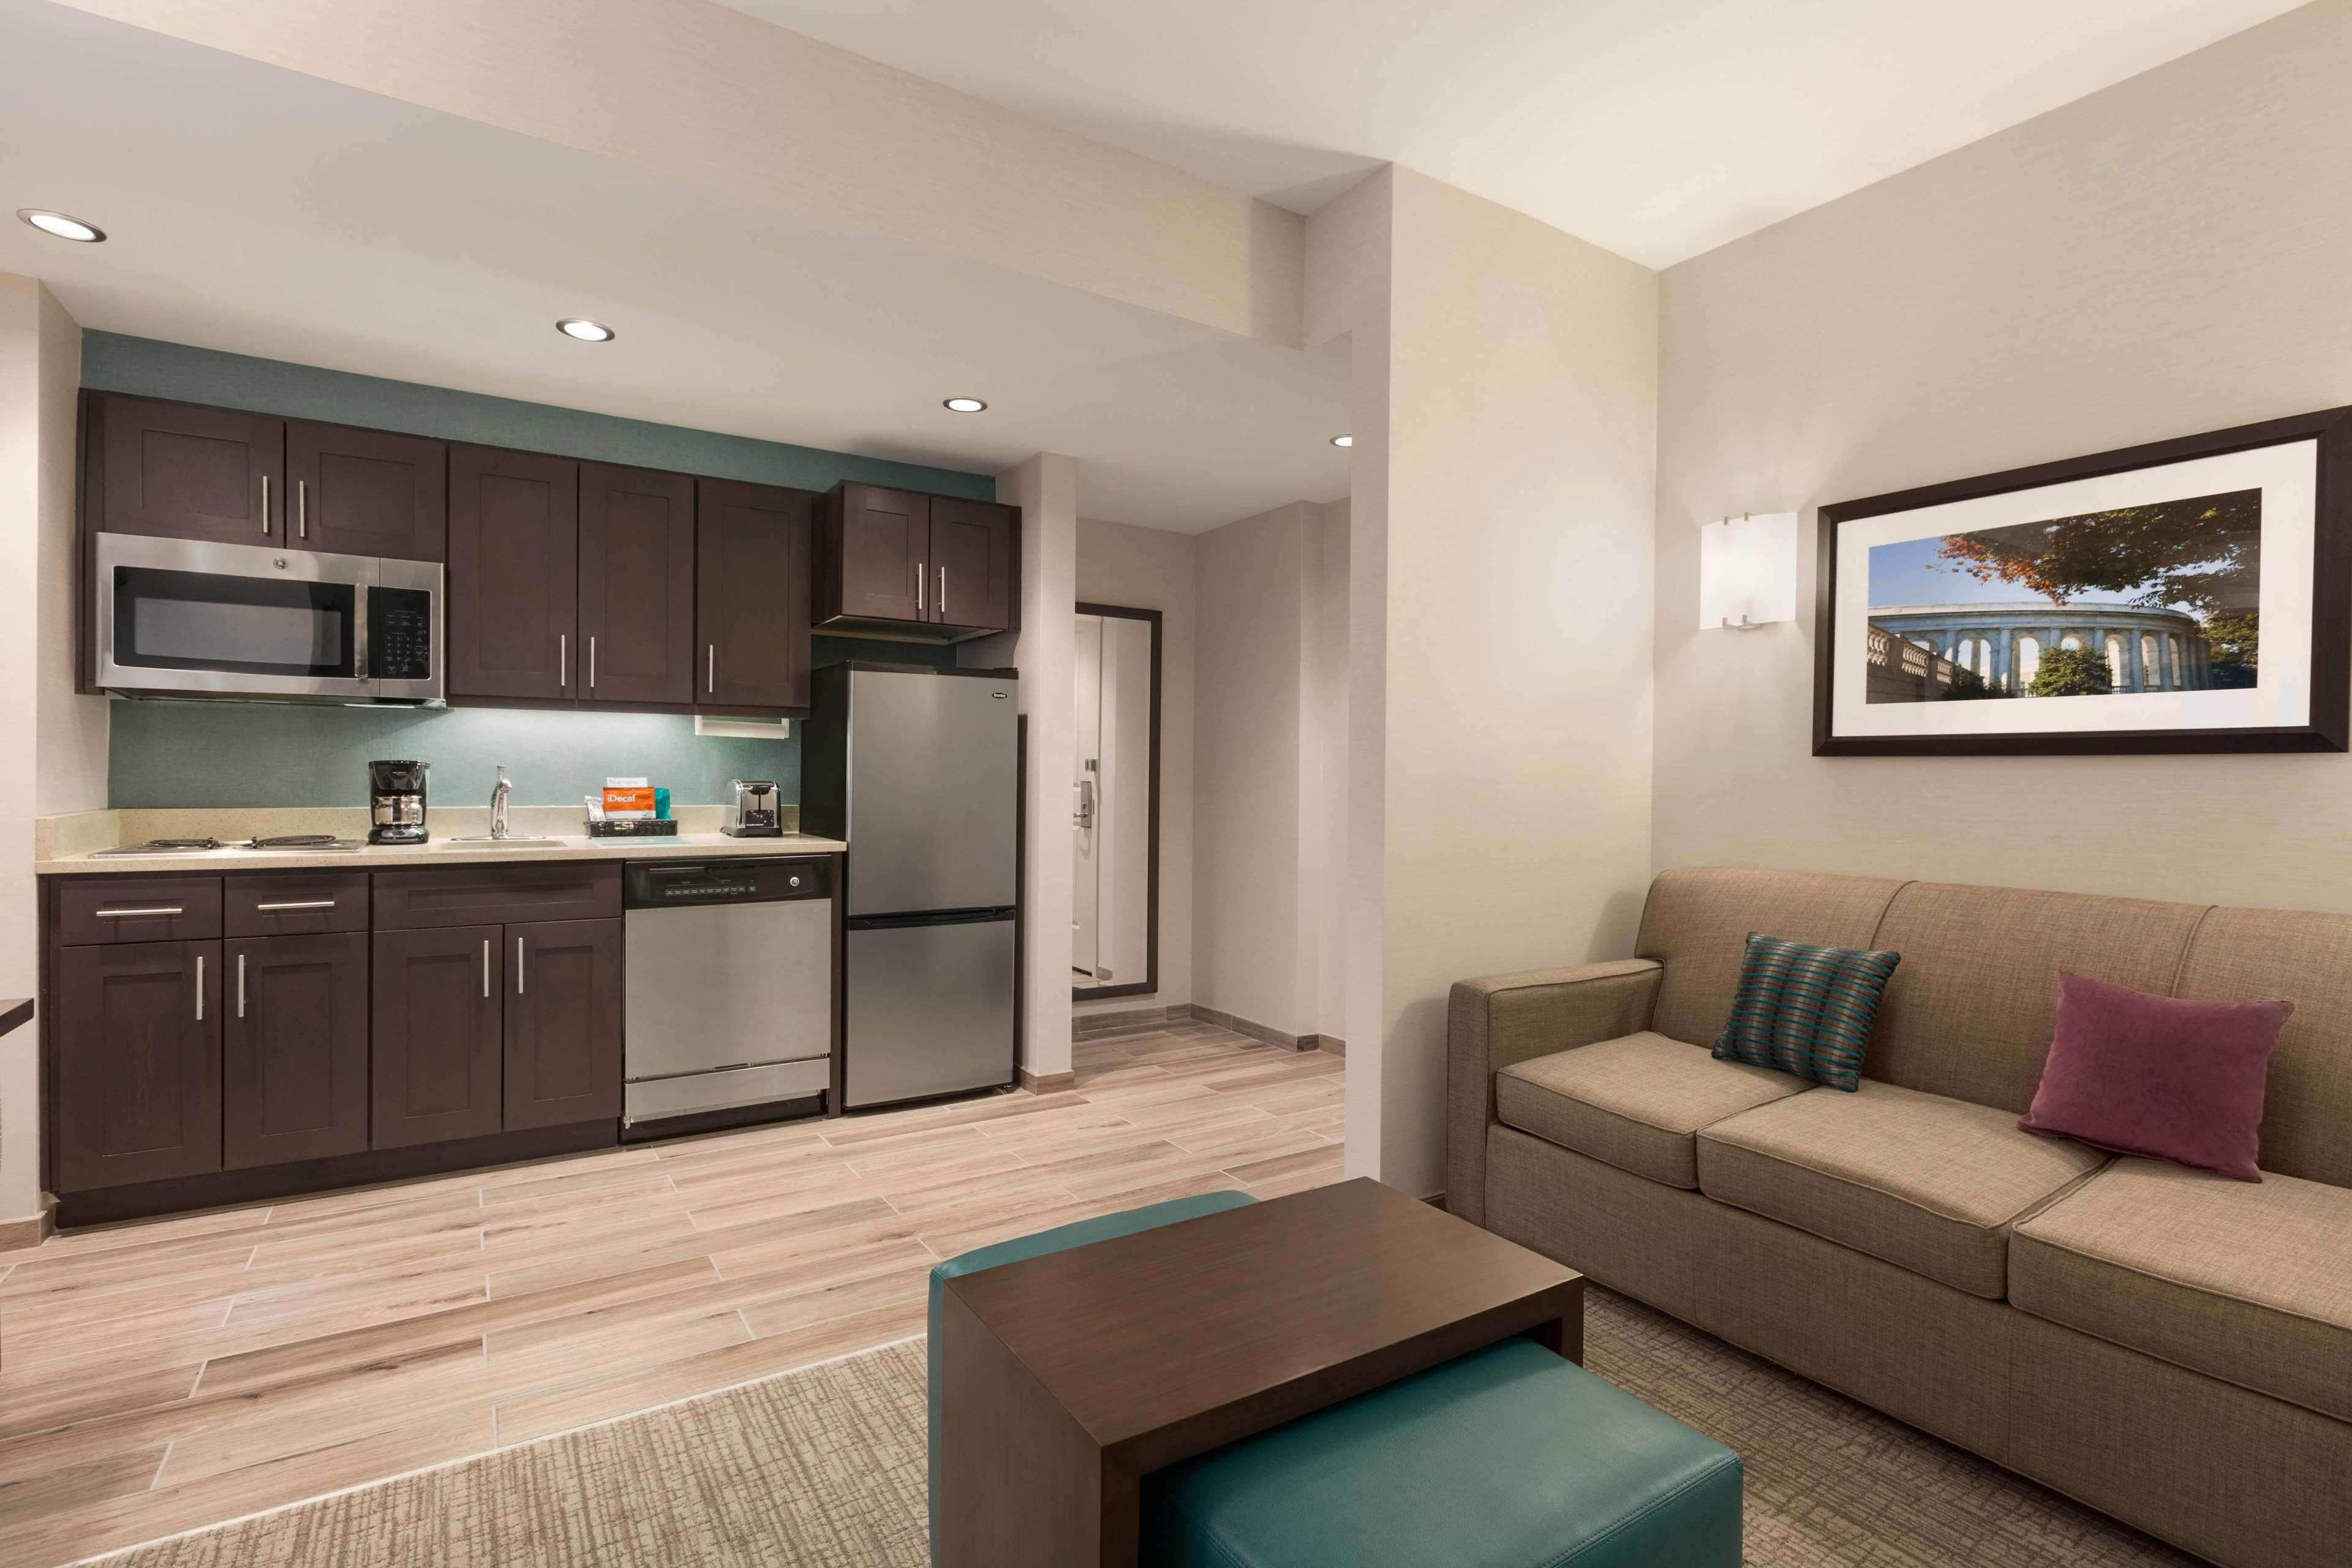 Homewood Suites by Hilton Washington DC Convention Center image 24